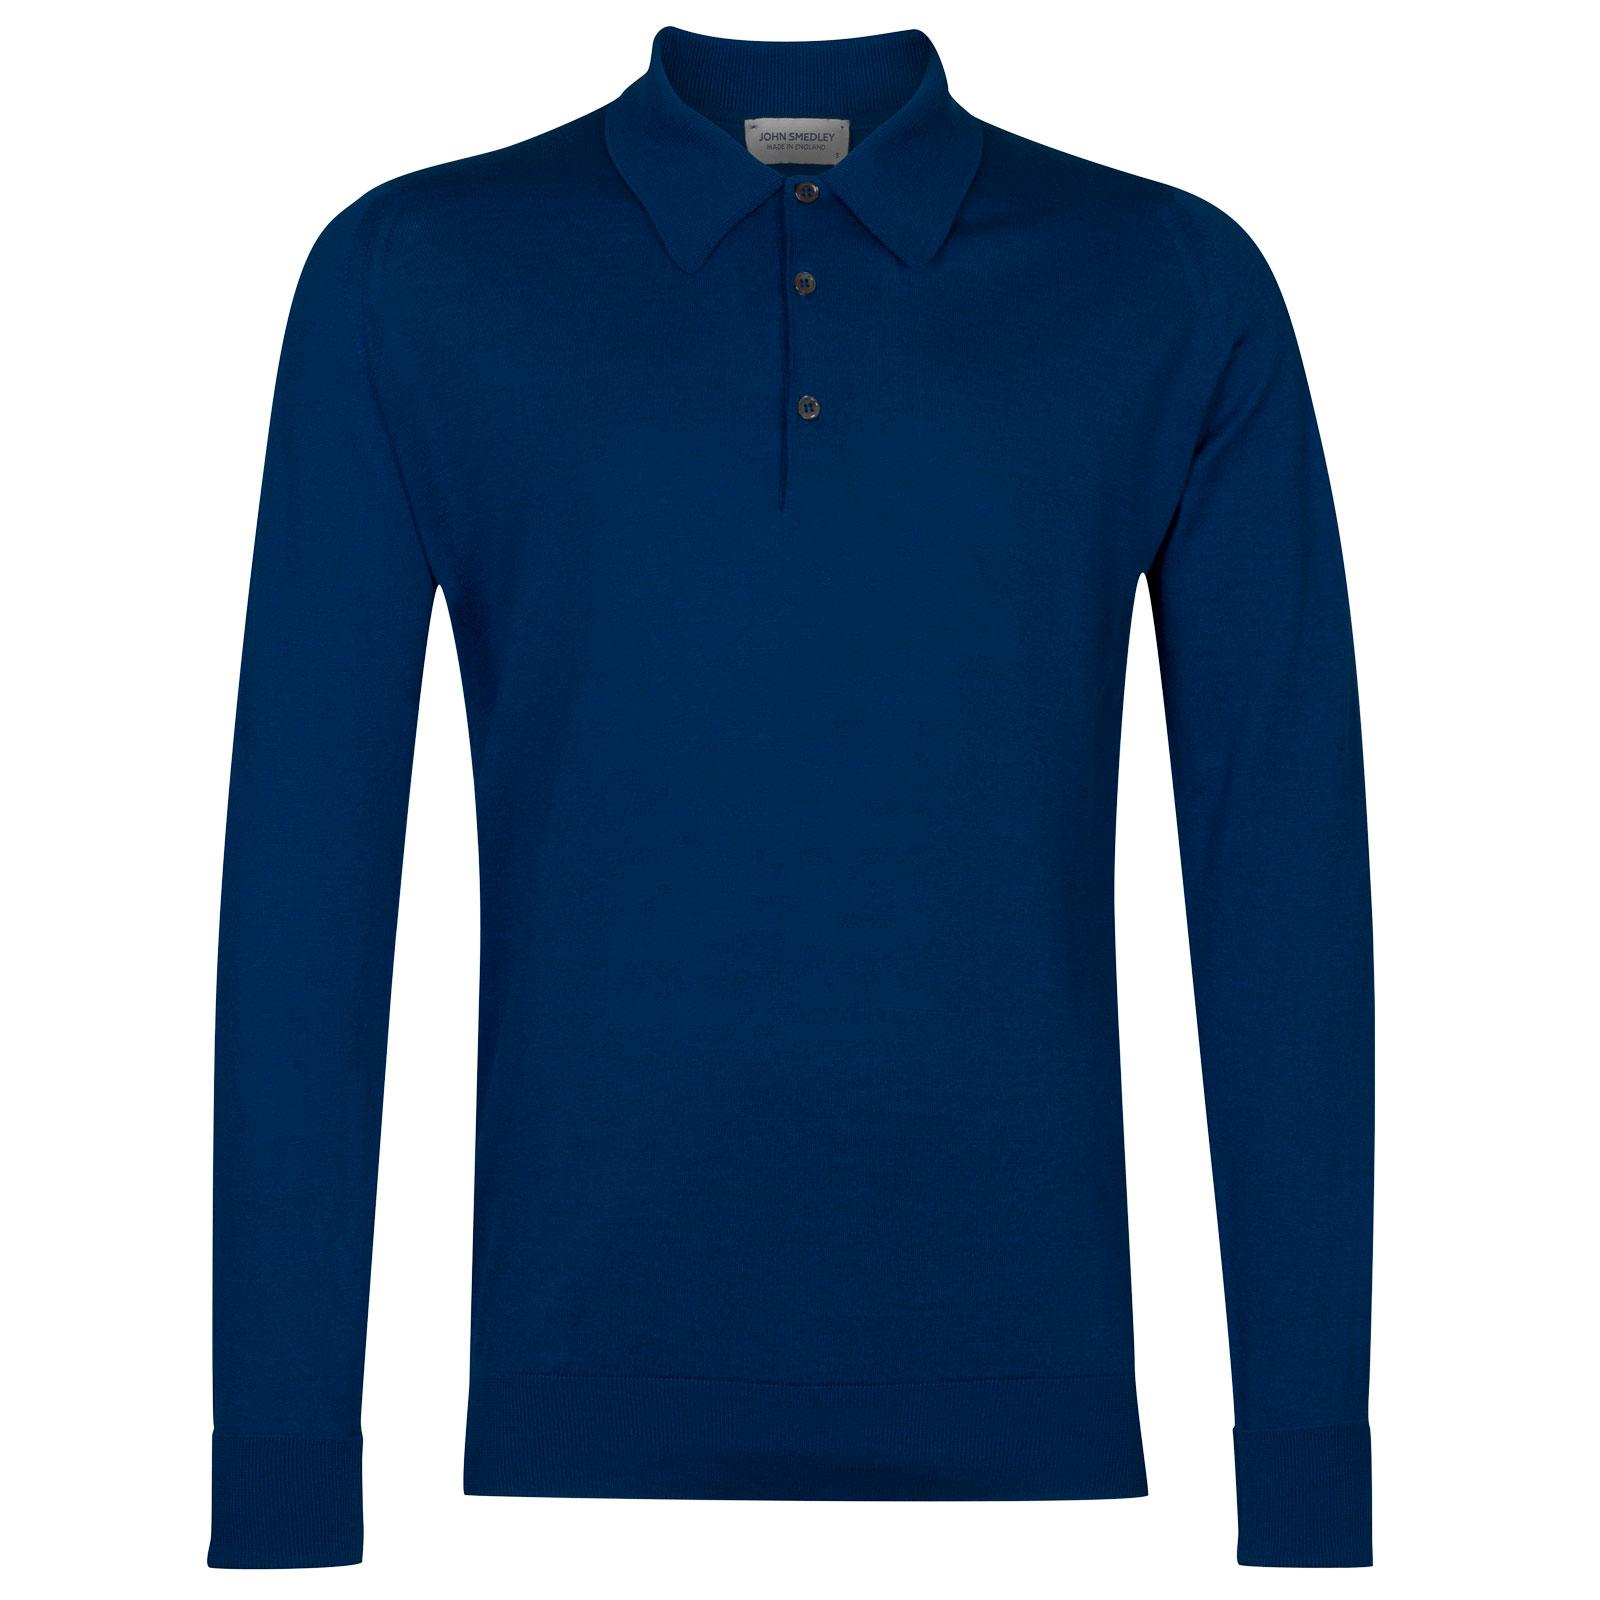 finchley-stevens-blue-Xxl